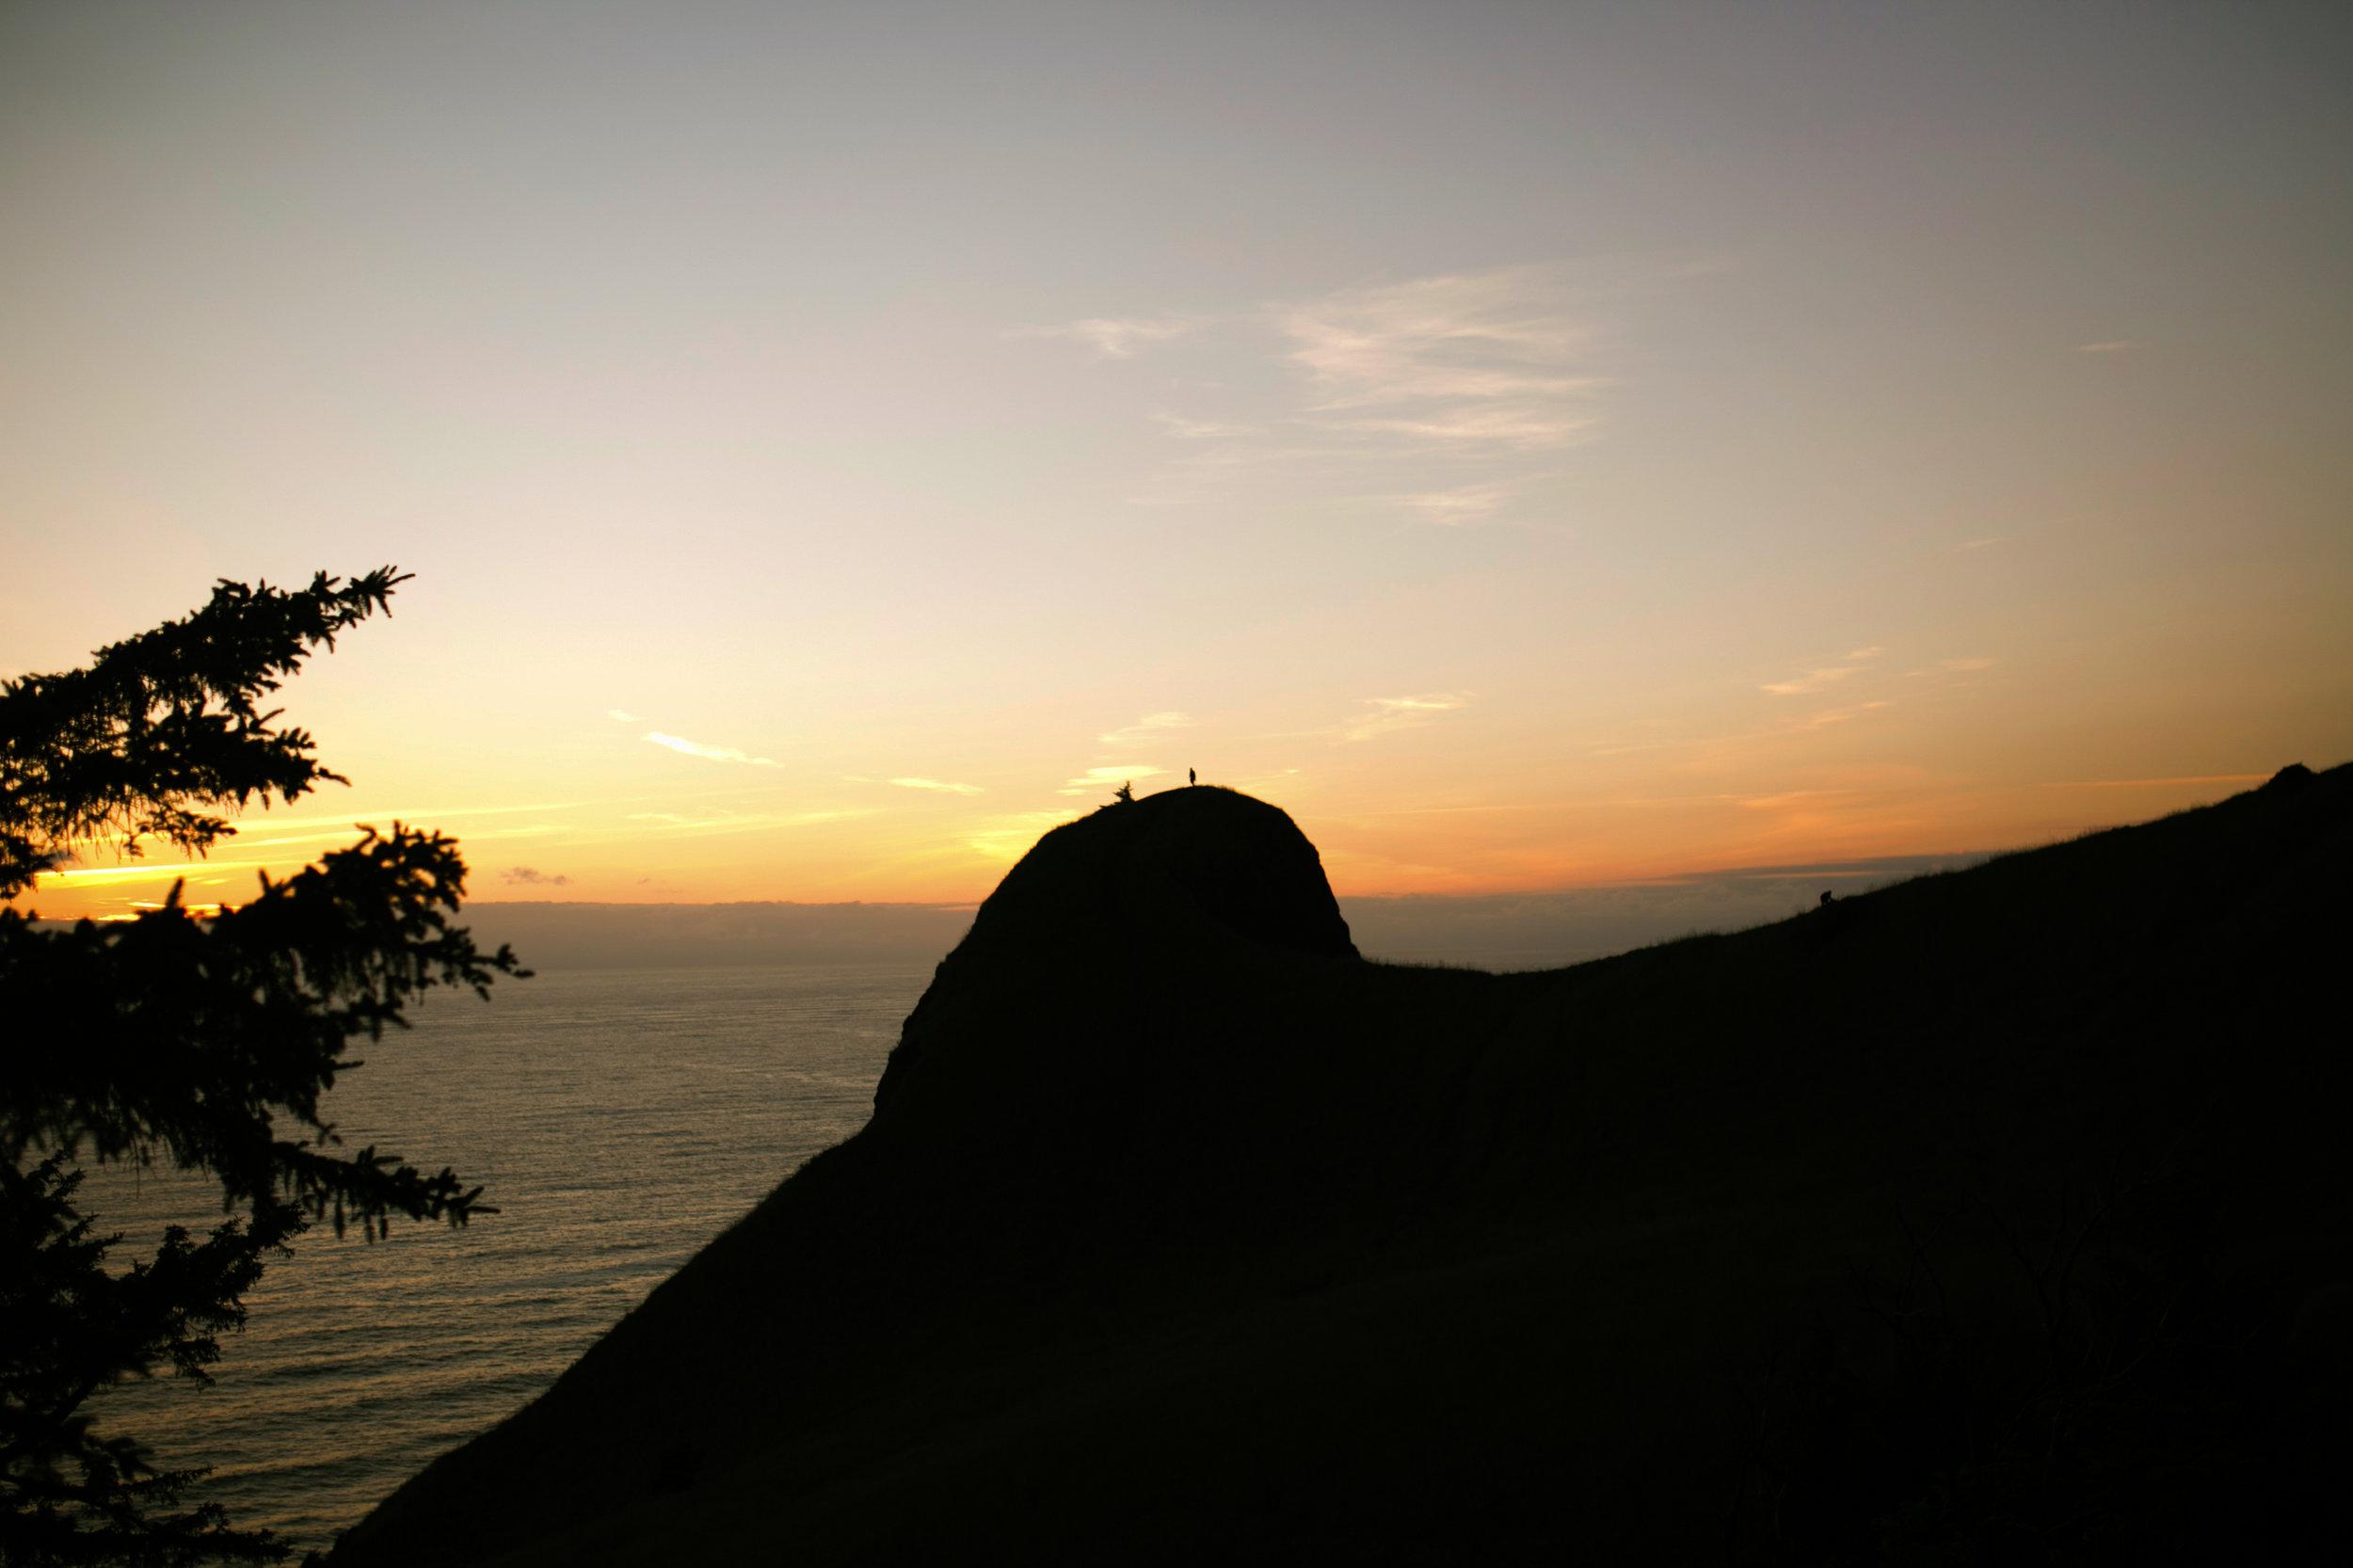 091Travel_Adventure_Outdoor_Photography_Outlive_Creative_Oregon_Coast_Gods_Thumb_sunset.jpg